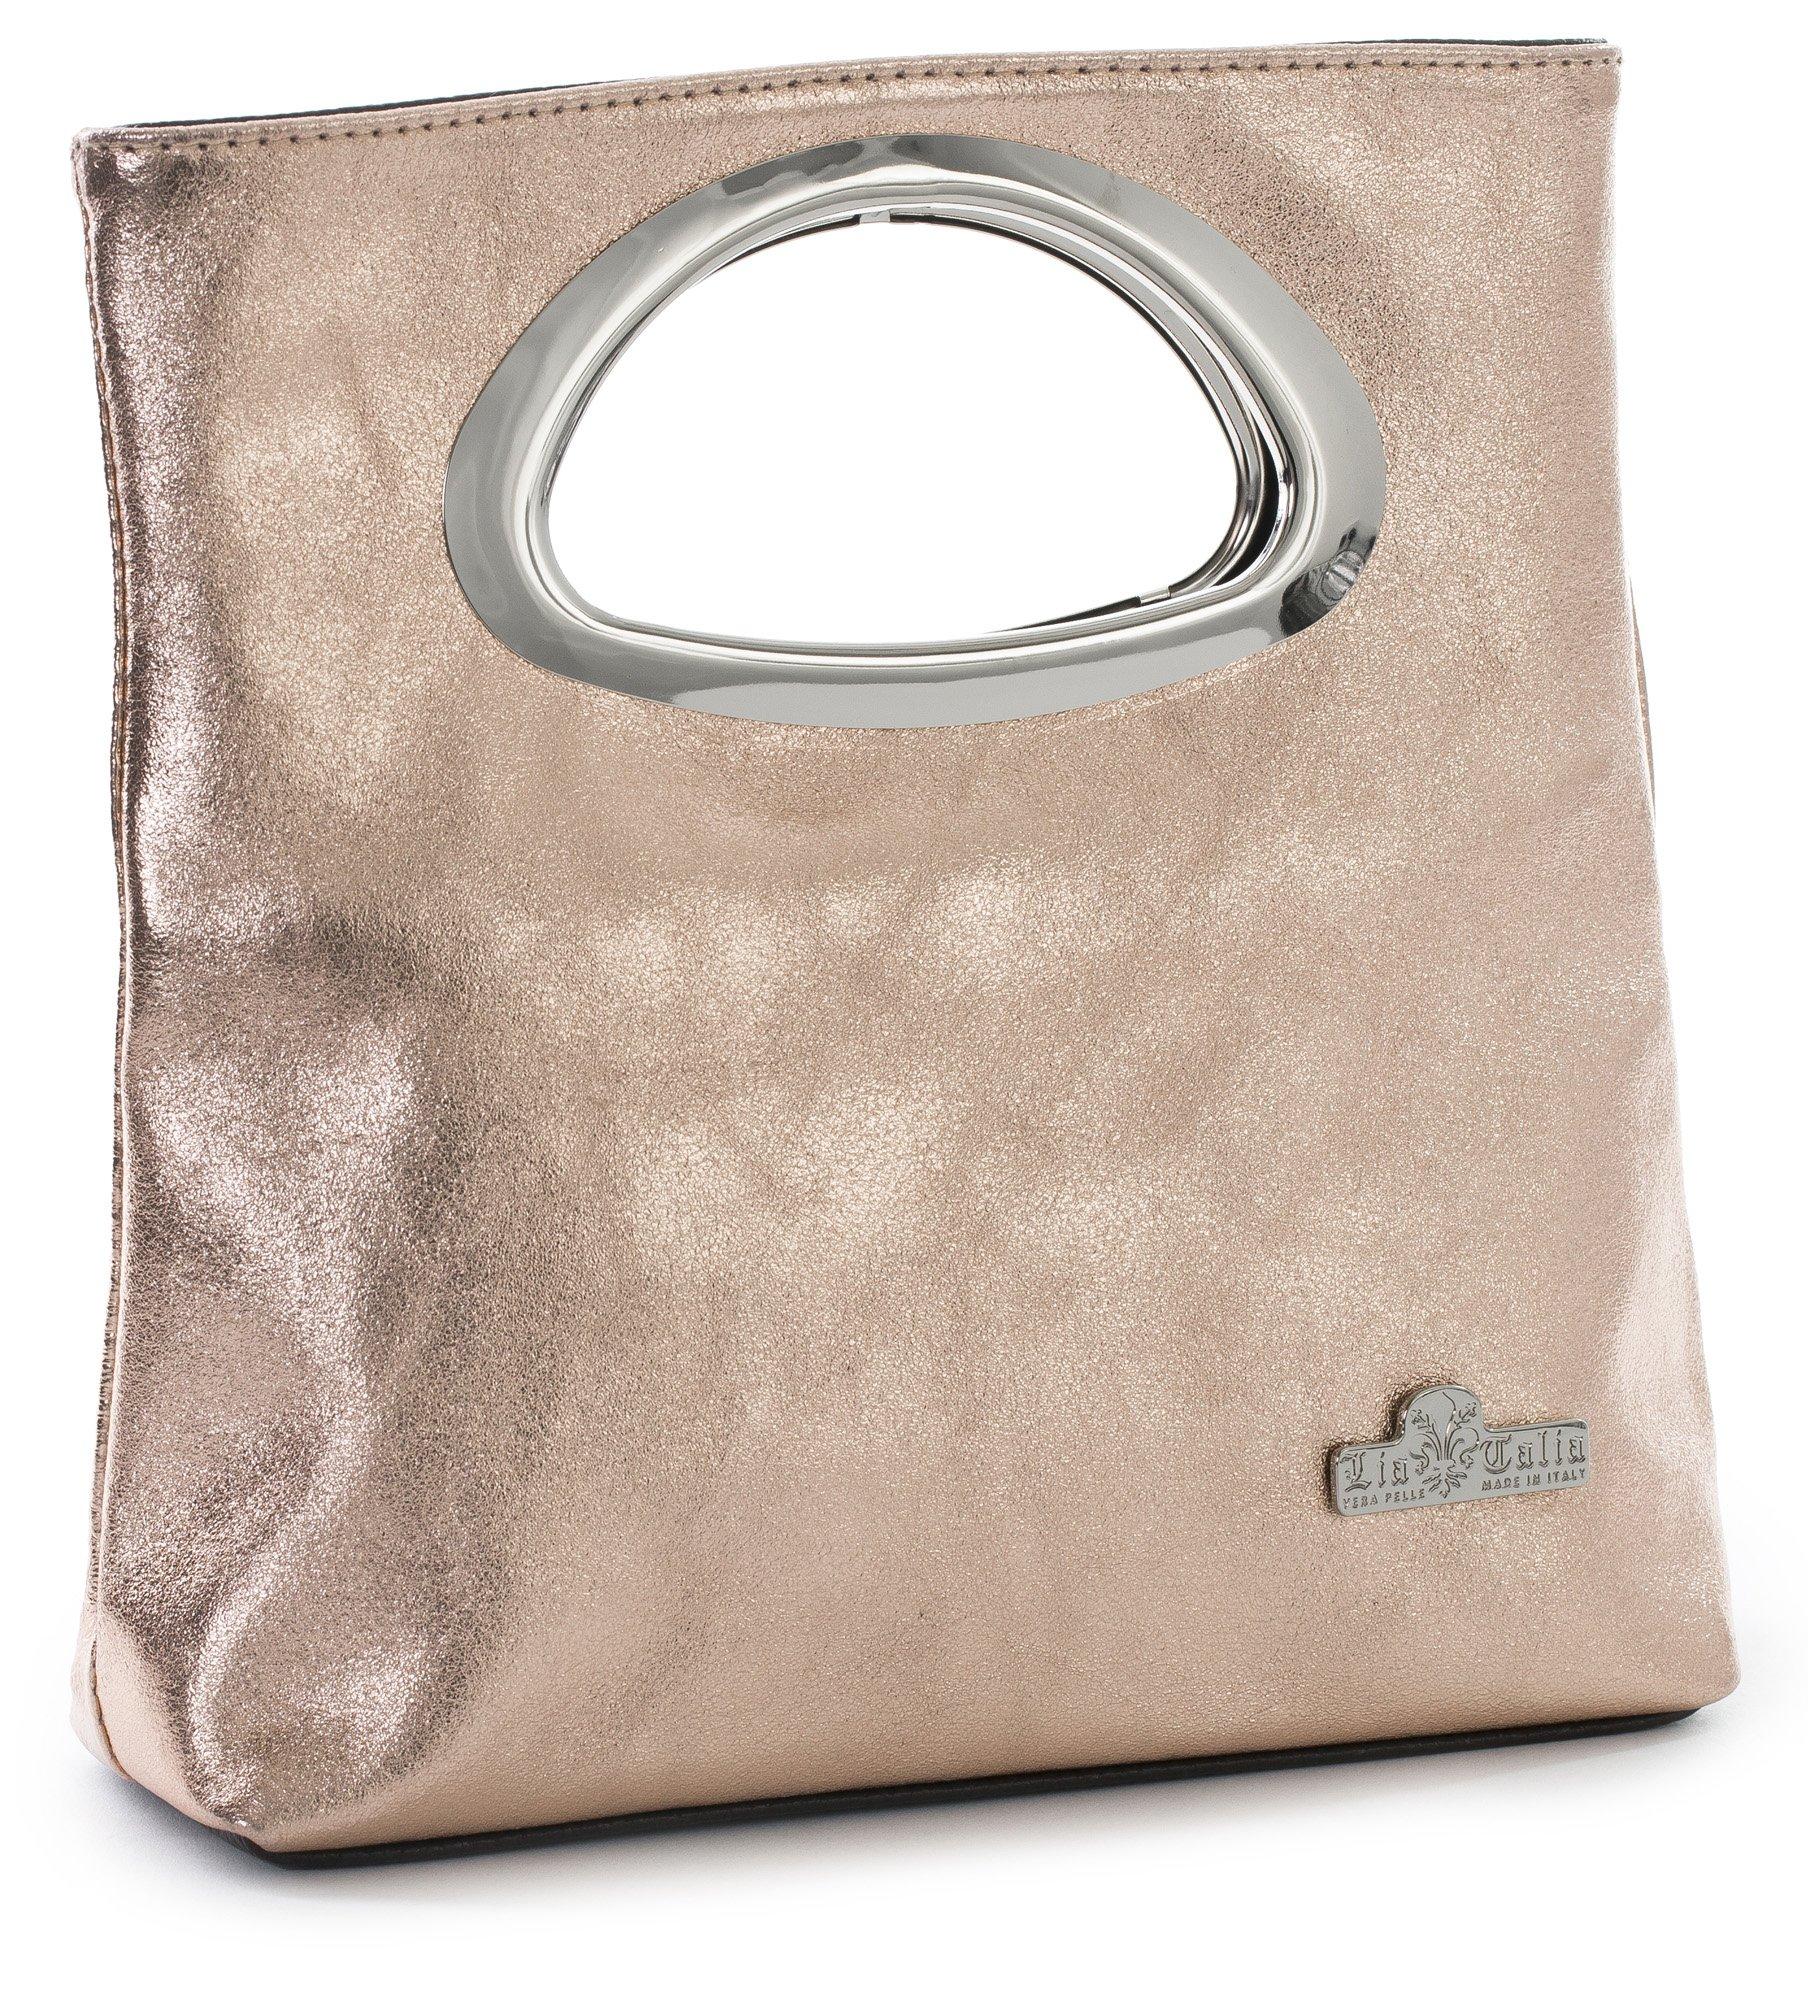 LIATALIA Plain Italian Suede Leather Top Handle Small Foldable Evening Purse Clutch Bag - RHEA [Metallic - Rose Gold]